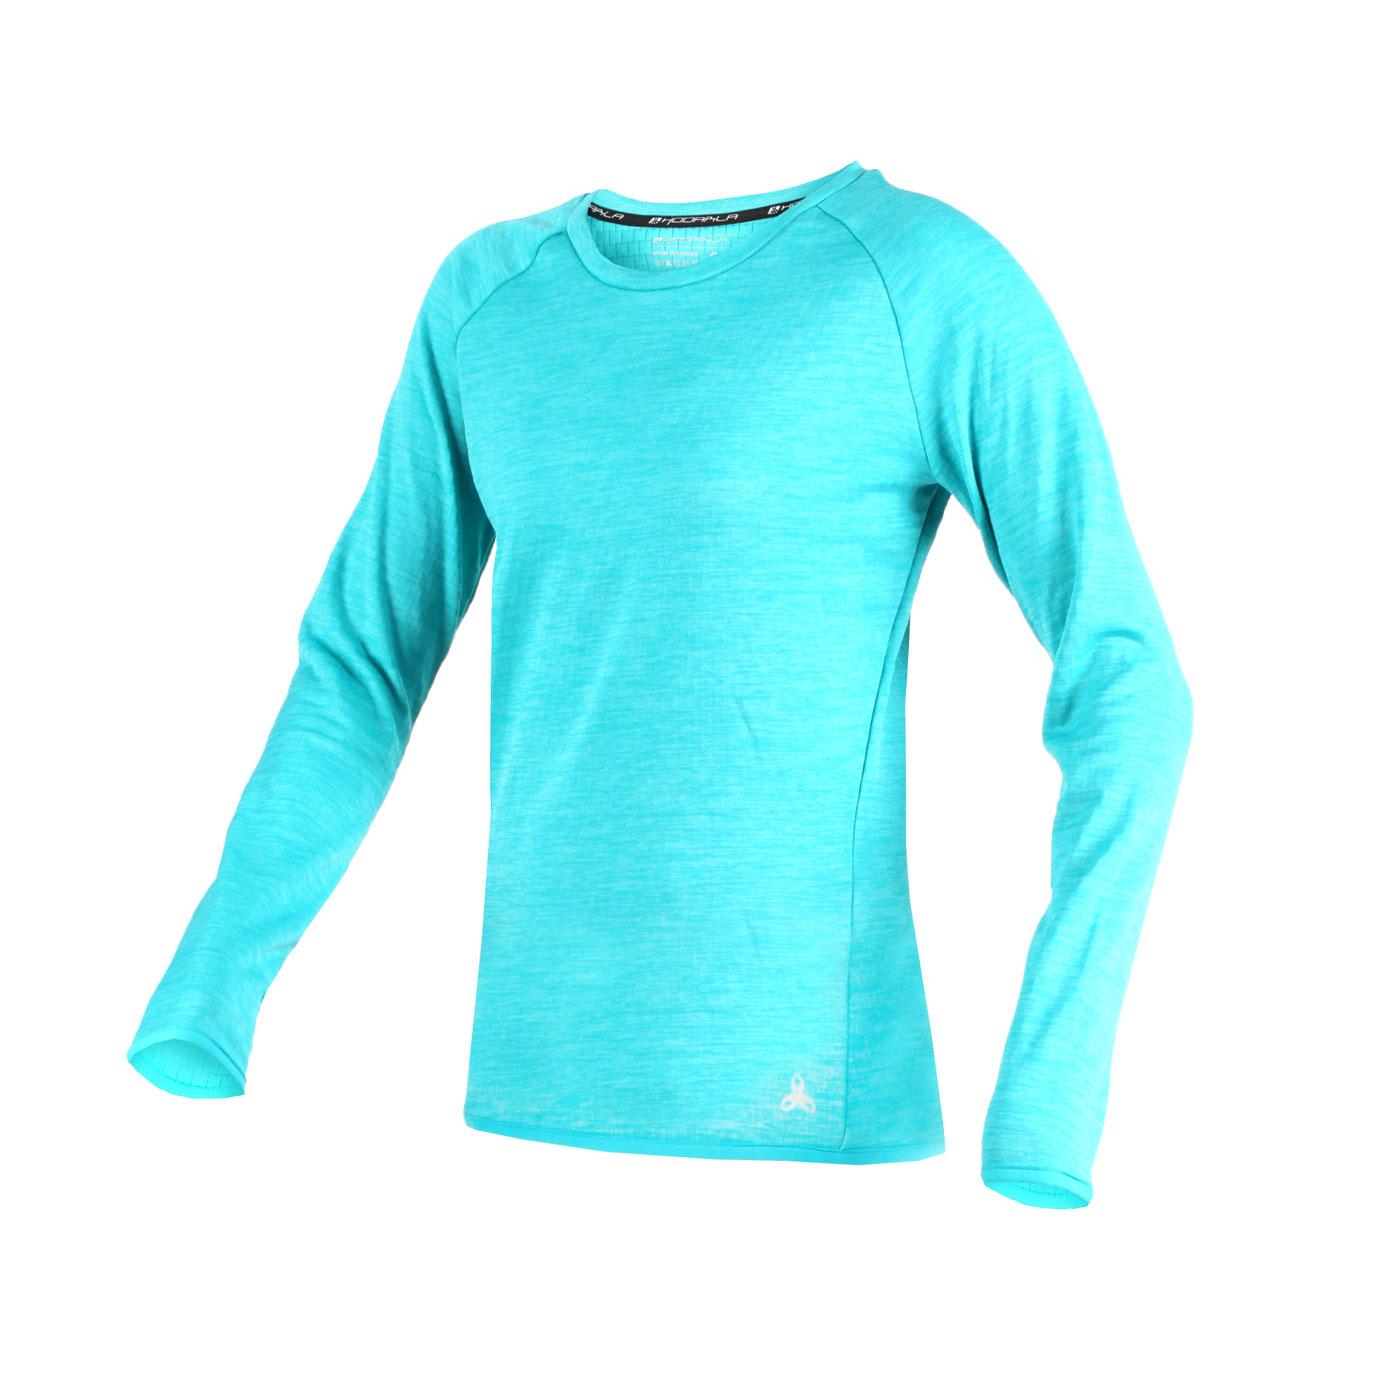 HODARLA 女-超爆暖保暖衣 3148901 - 麻花湖水藍